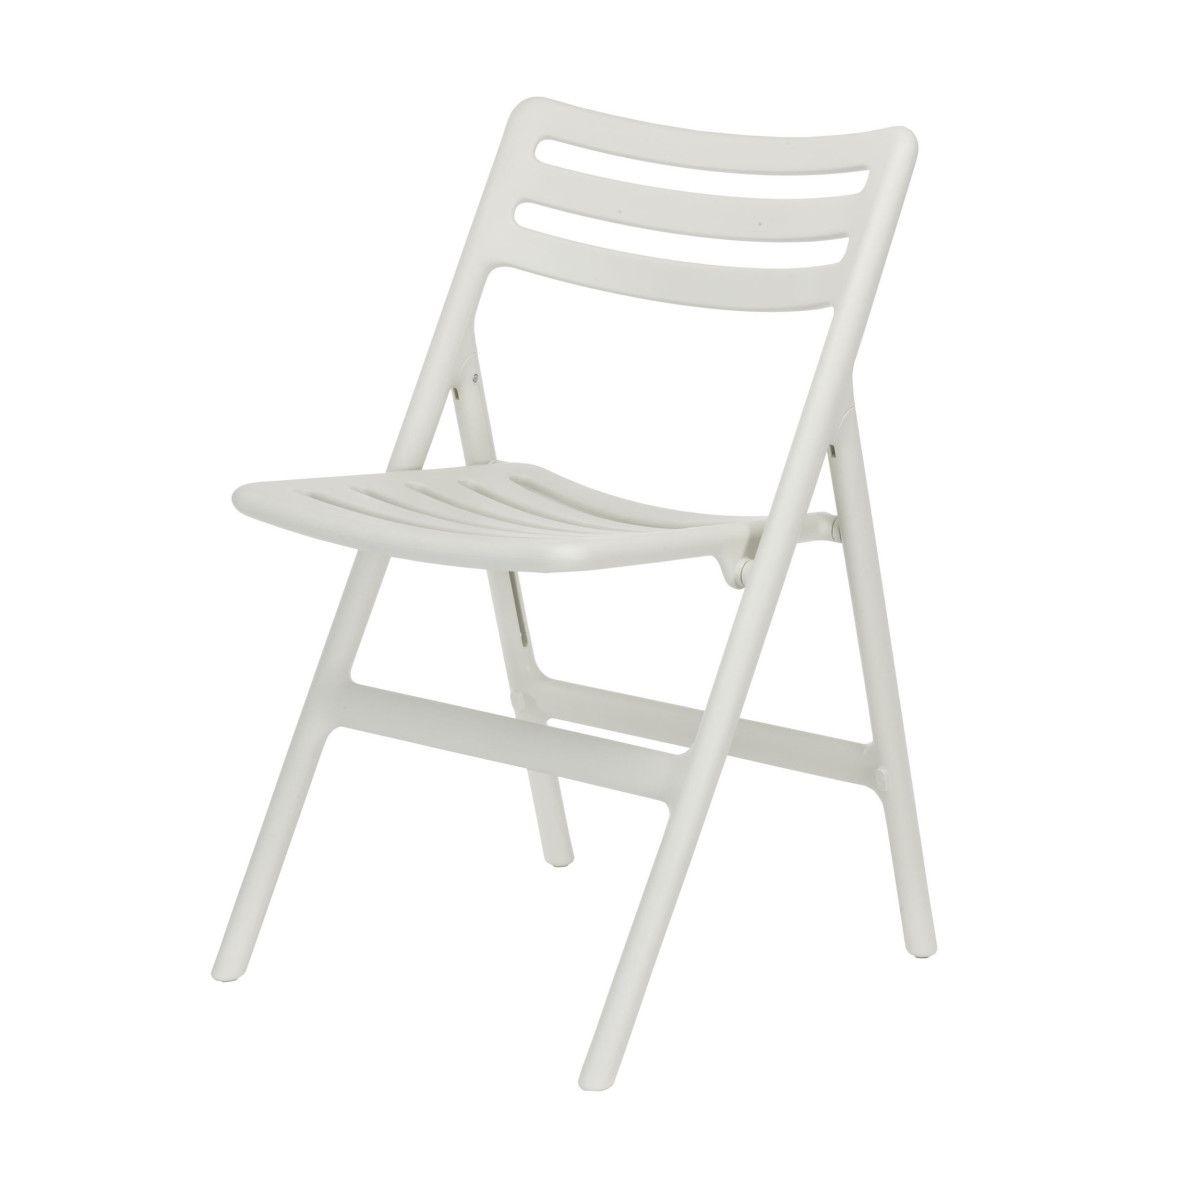 Folding Air-Chair Klappstuhl Jetzt bestellen unter: https://moebel ...